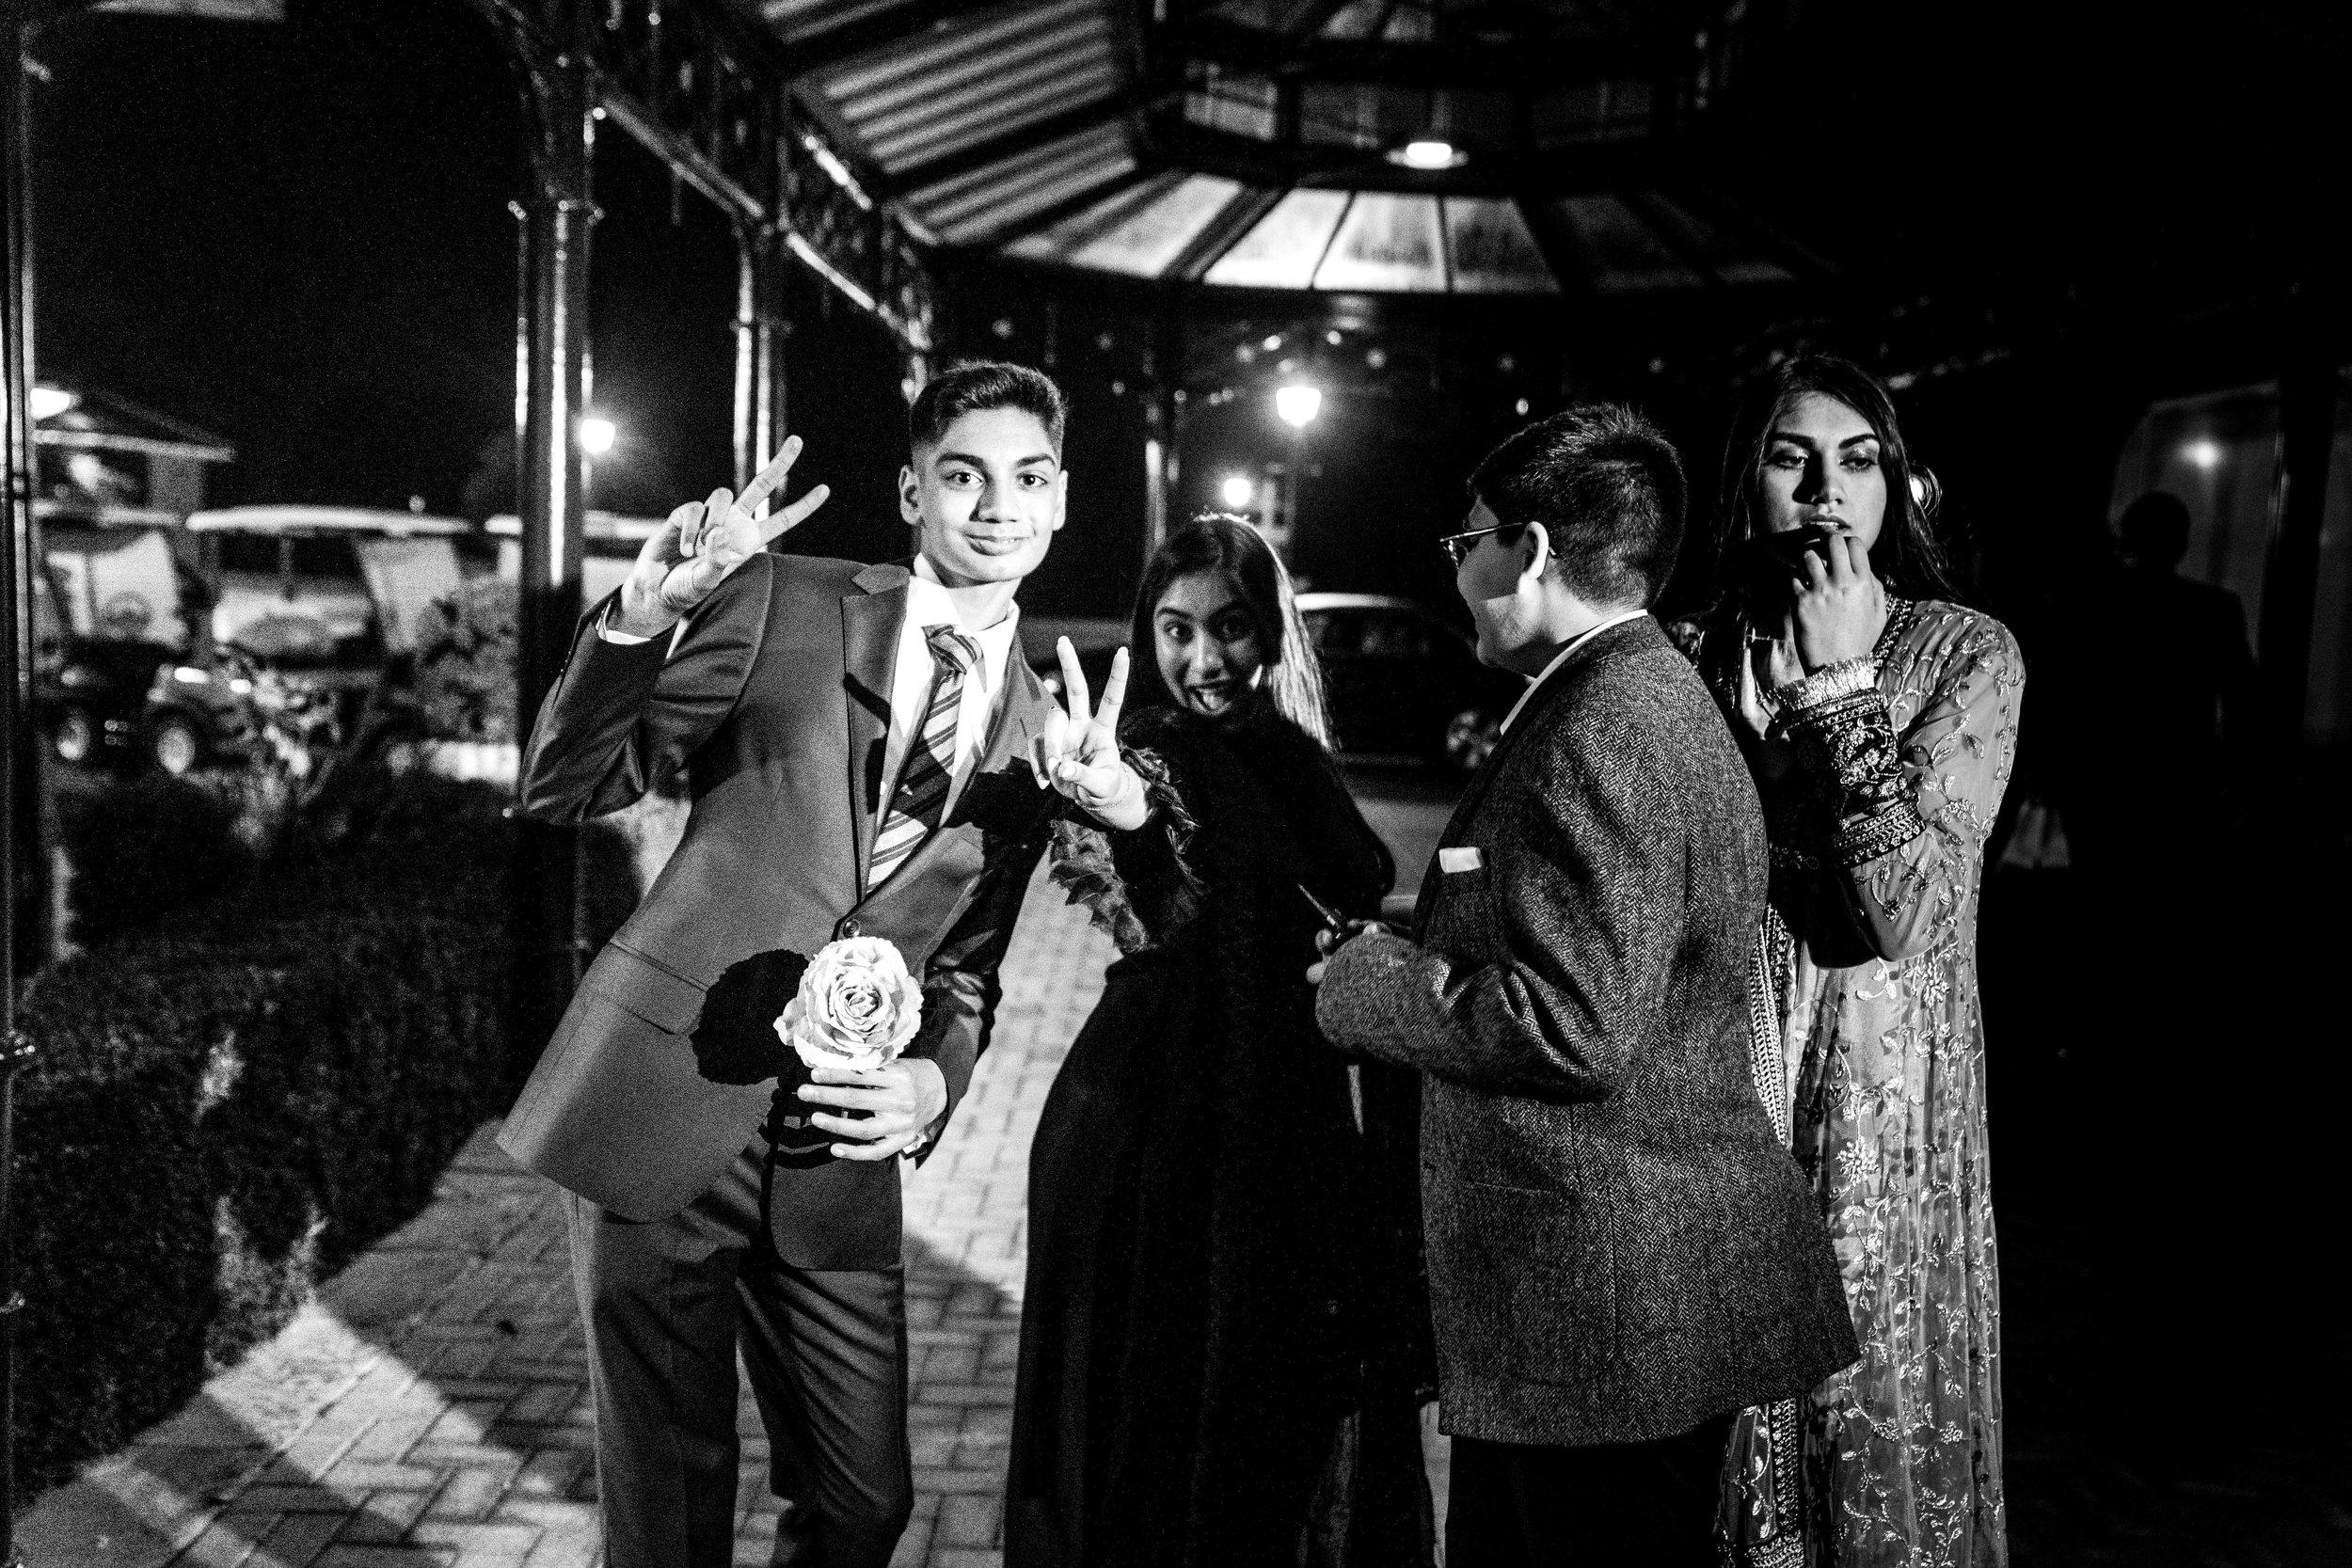 buckinghamshire-golf-club-winter-muslim-wedding-engagement-photography-videography-67